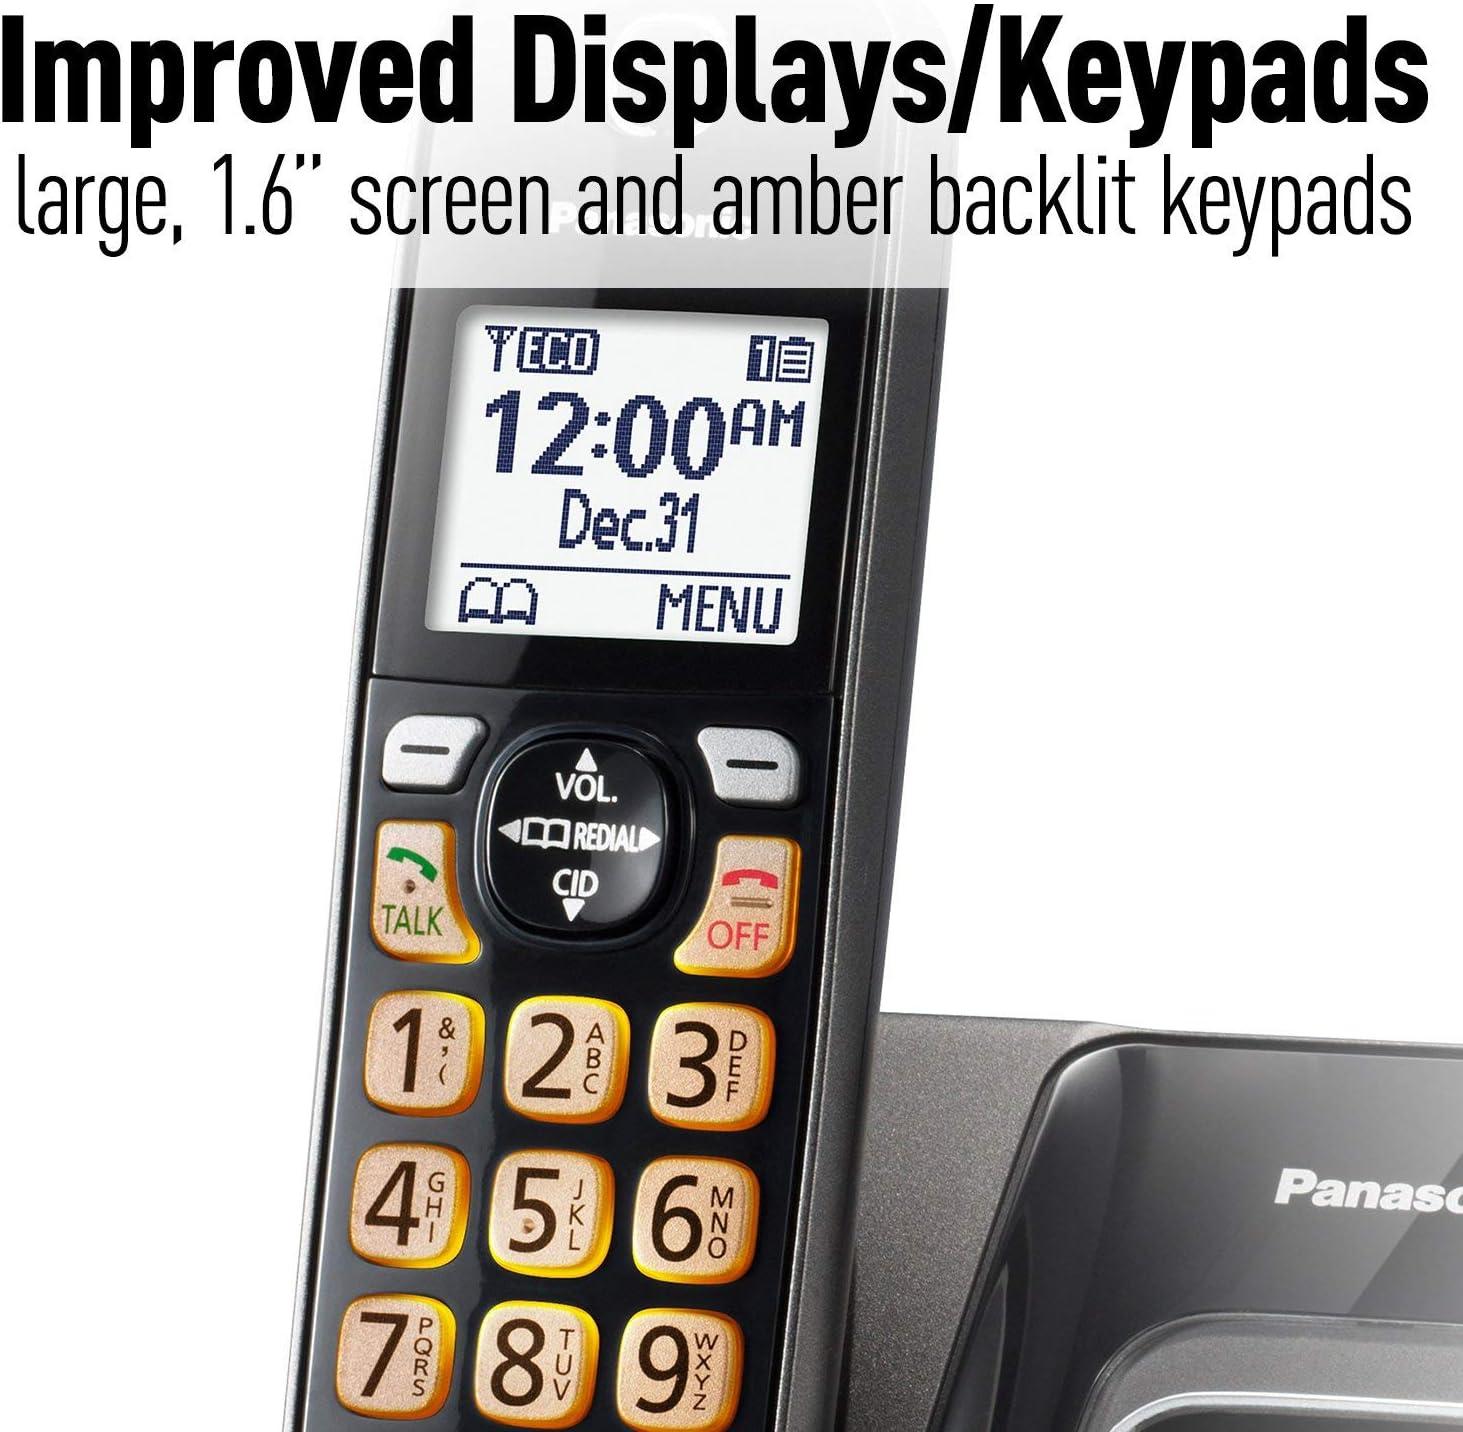 1 Cordless Handsets PANASONIC Expandable Cordless Phone System with Call Block and Answering Machine KX-TGD530M Metallic Black Renewed